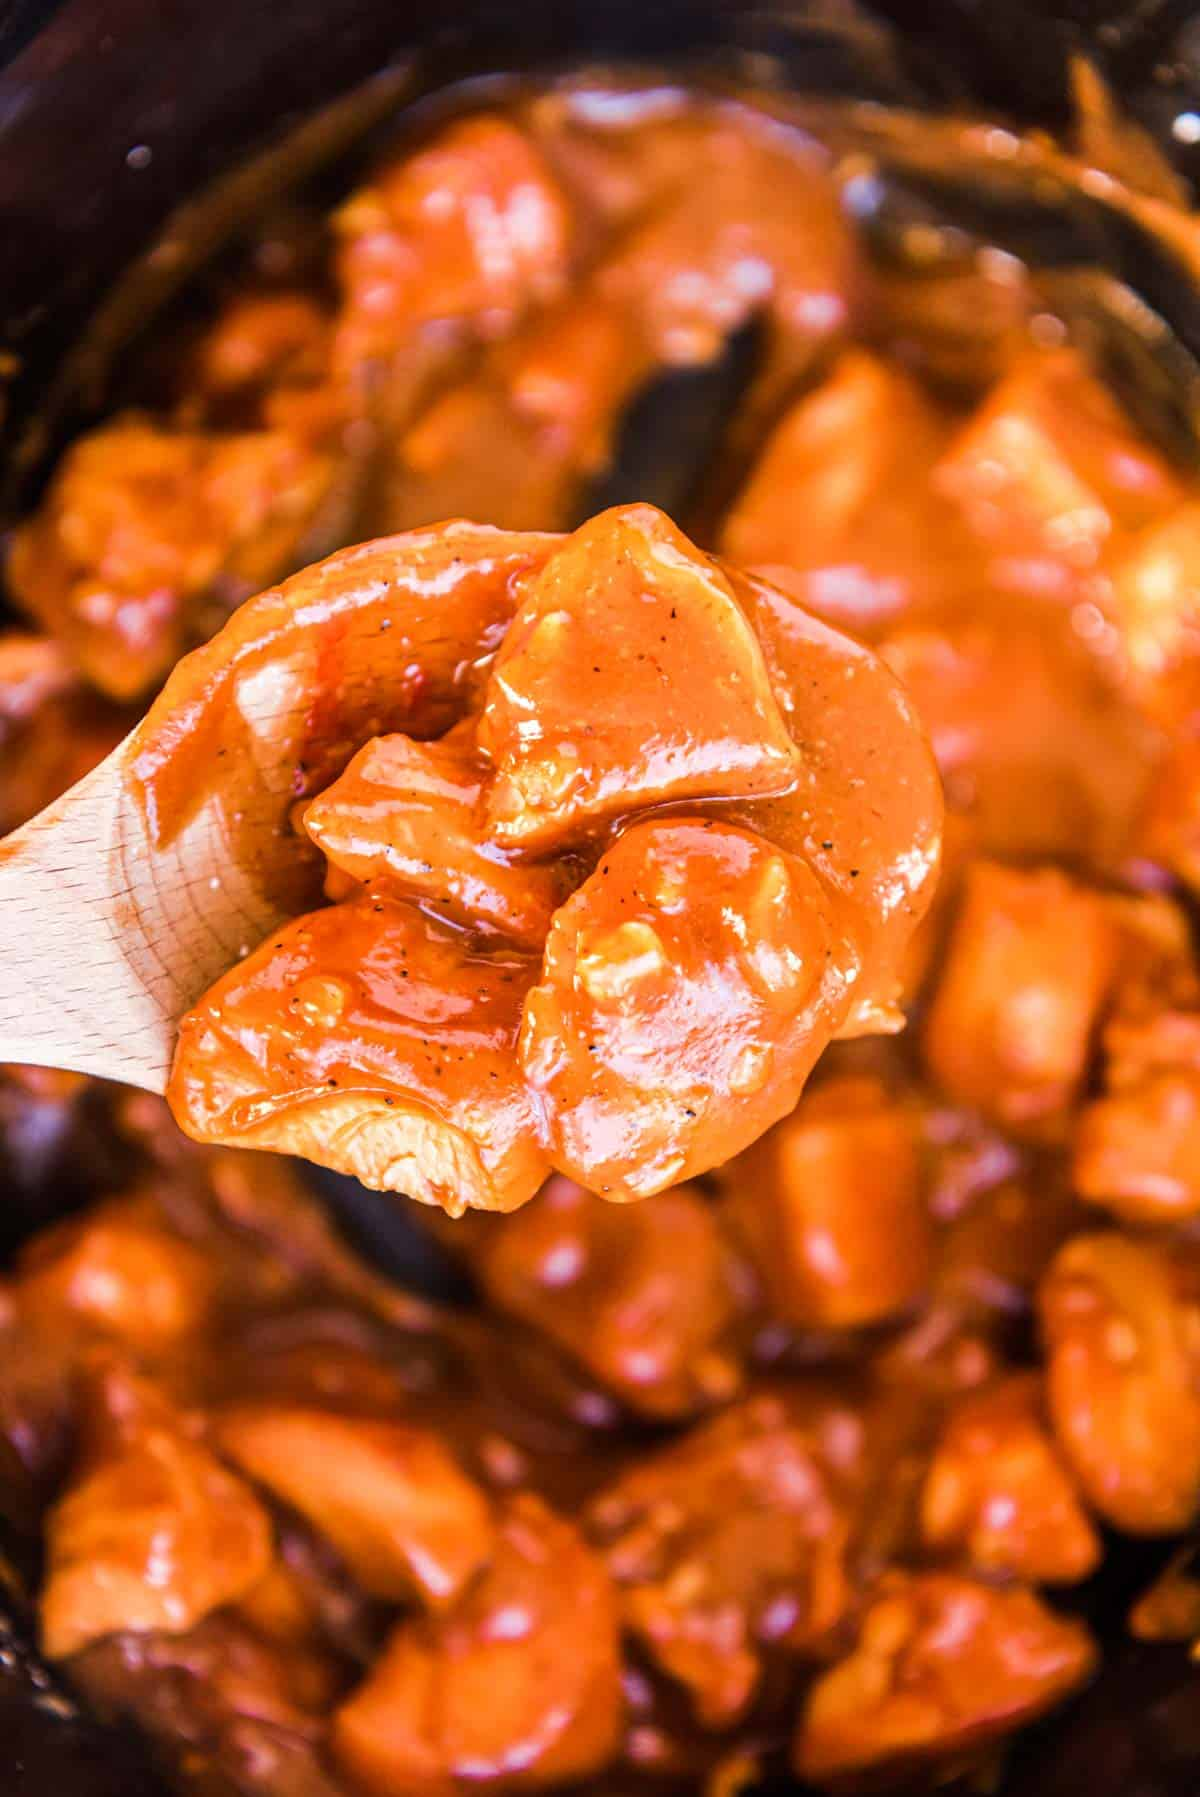 close up of the finished honey garlic chicken crock pot recipe inside the crockpot